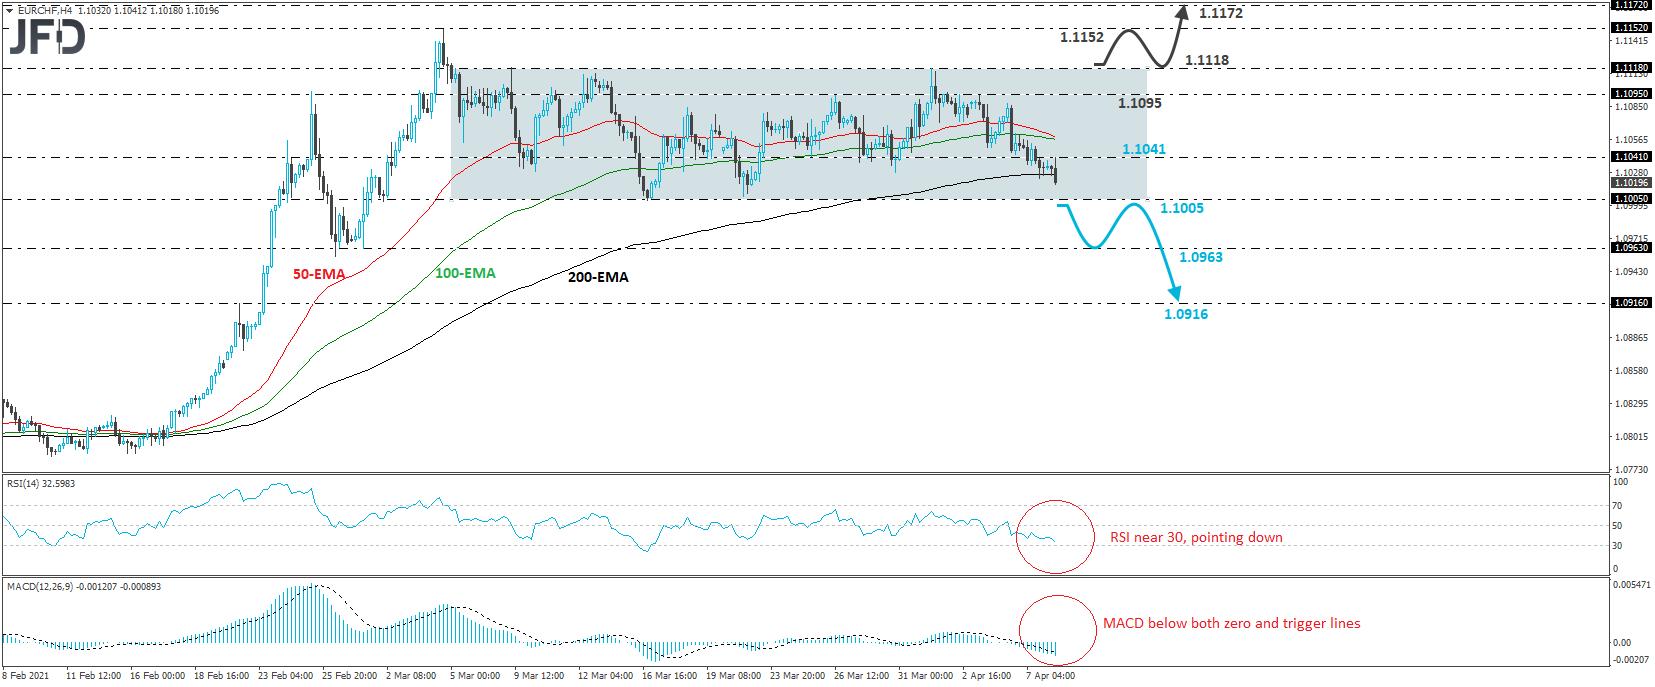 EUR/CHF 4-hour chart technical analysis